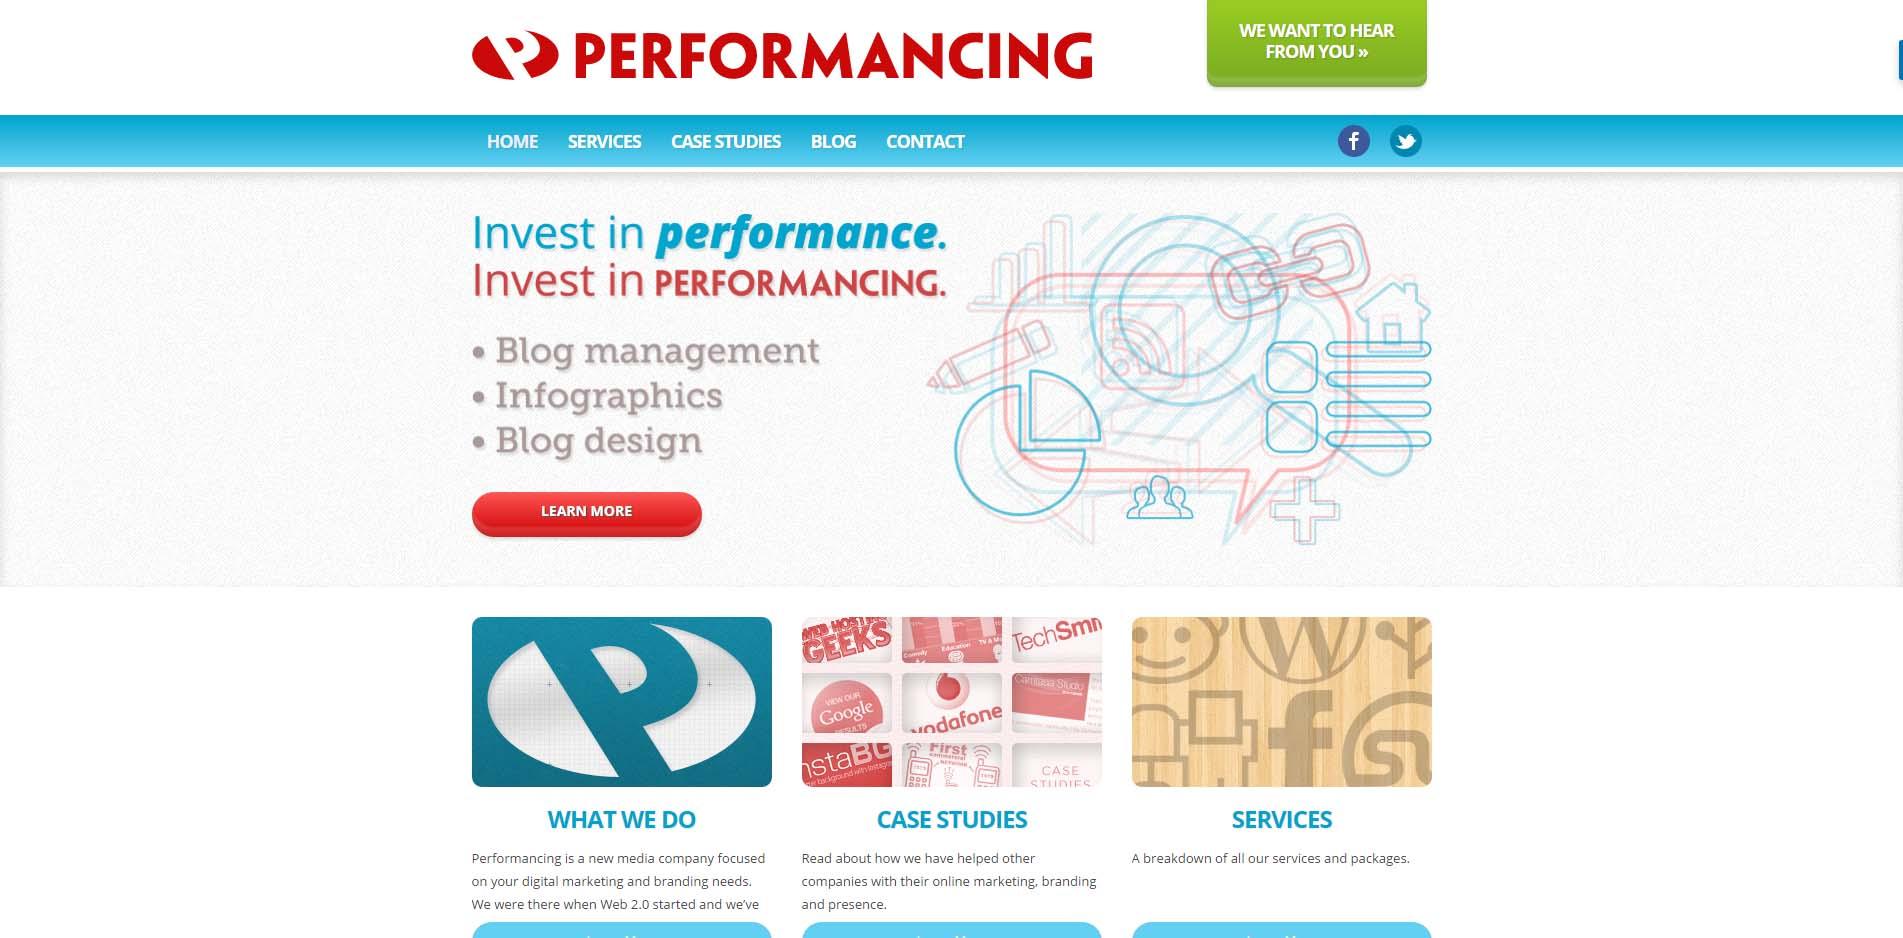 seo-blog-performancing-com